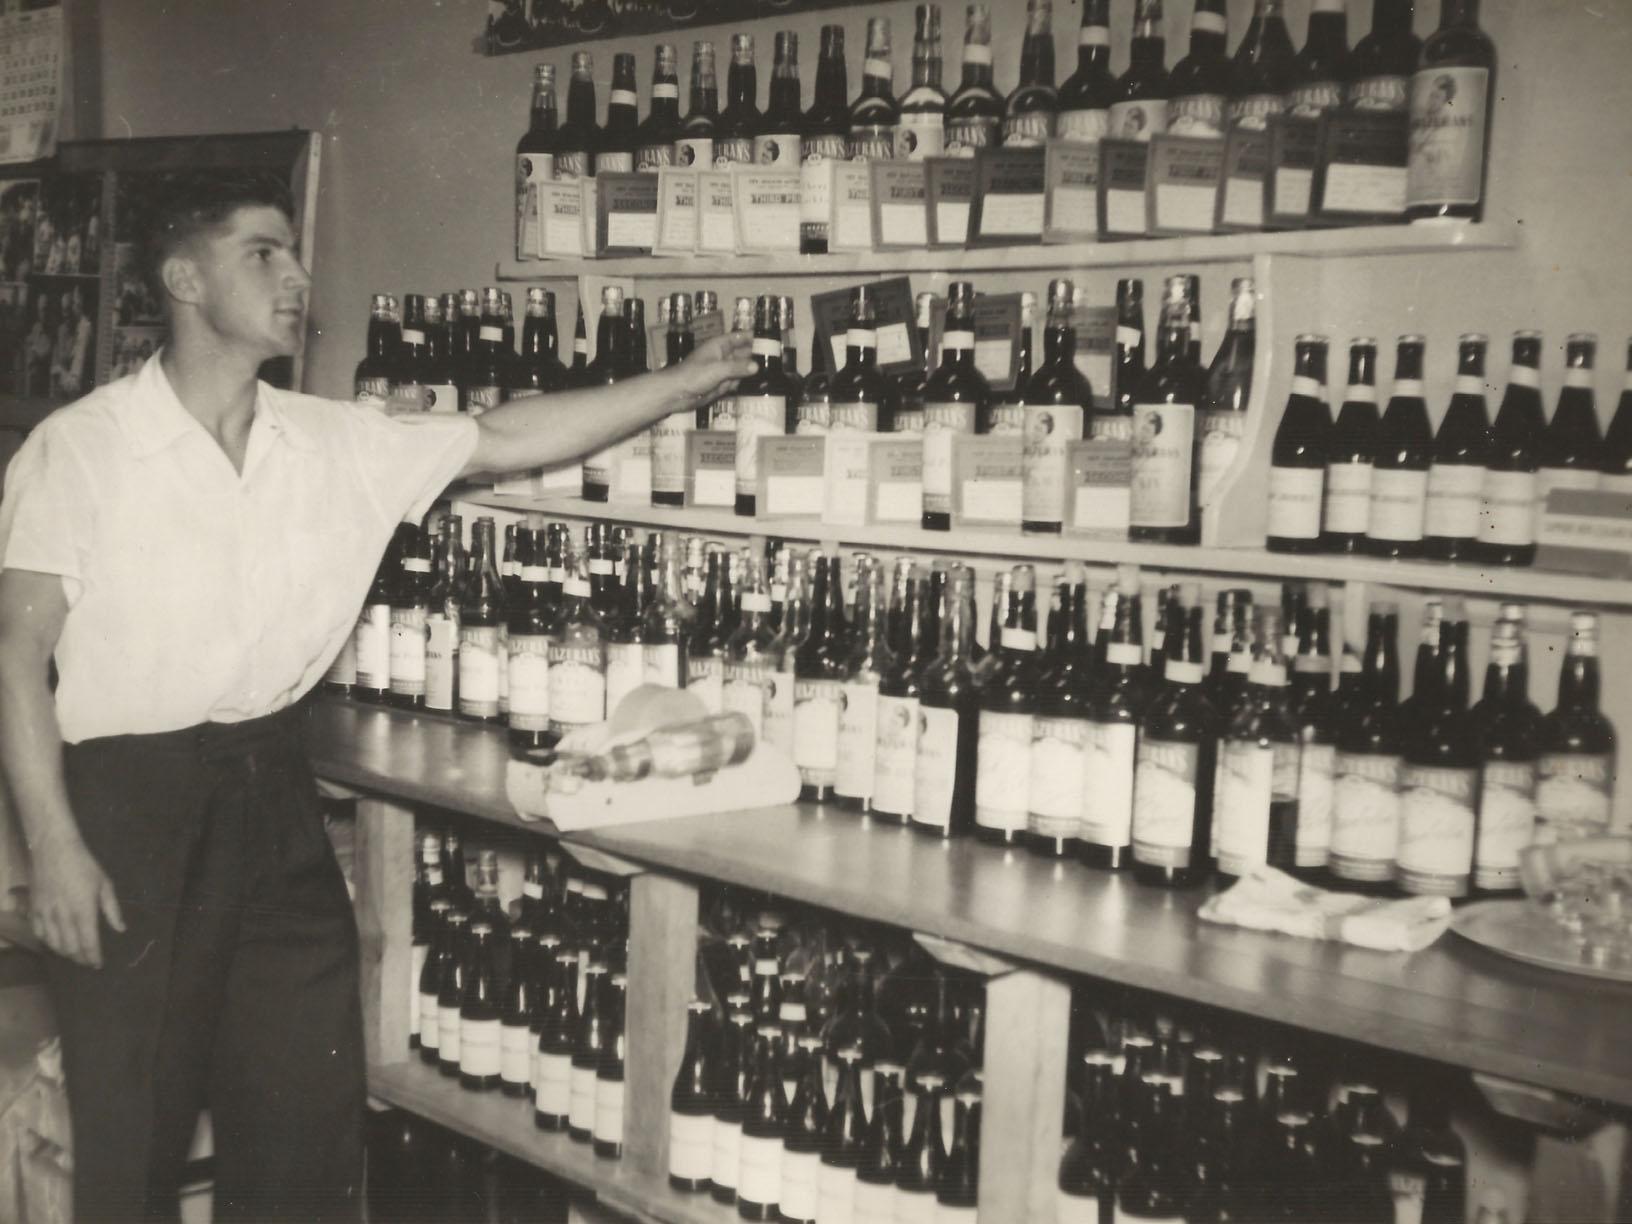 With fellow viticulturist Albert 1960s